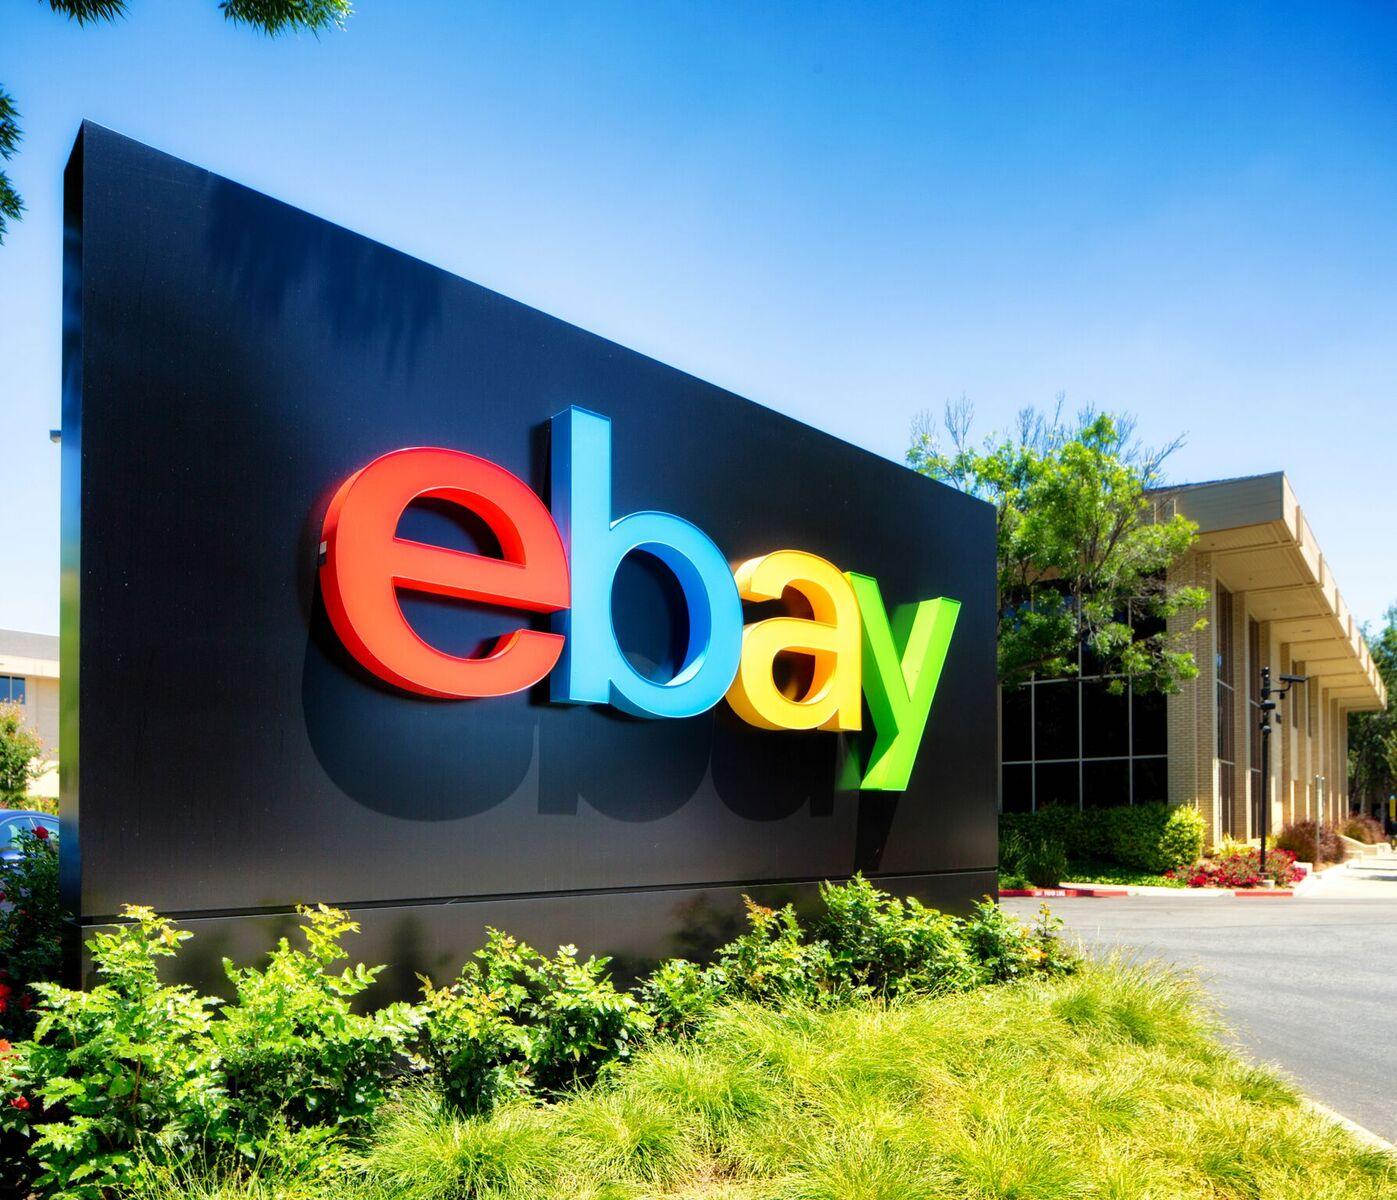 Ebay head quarters in San Jose California